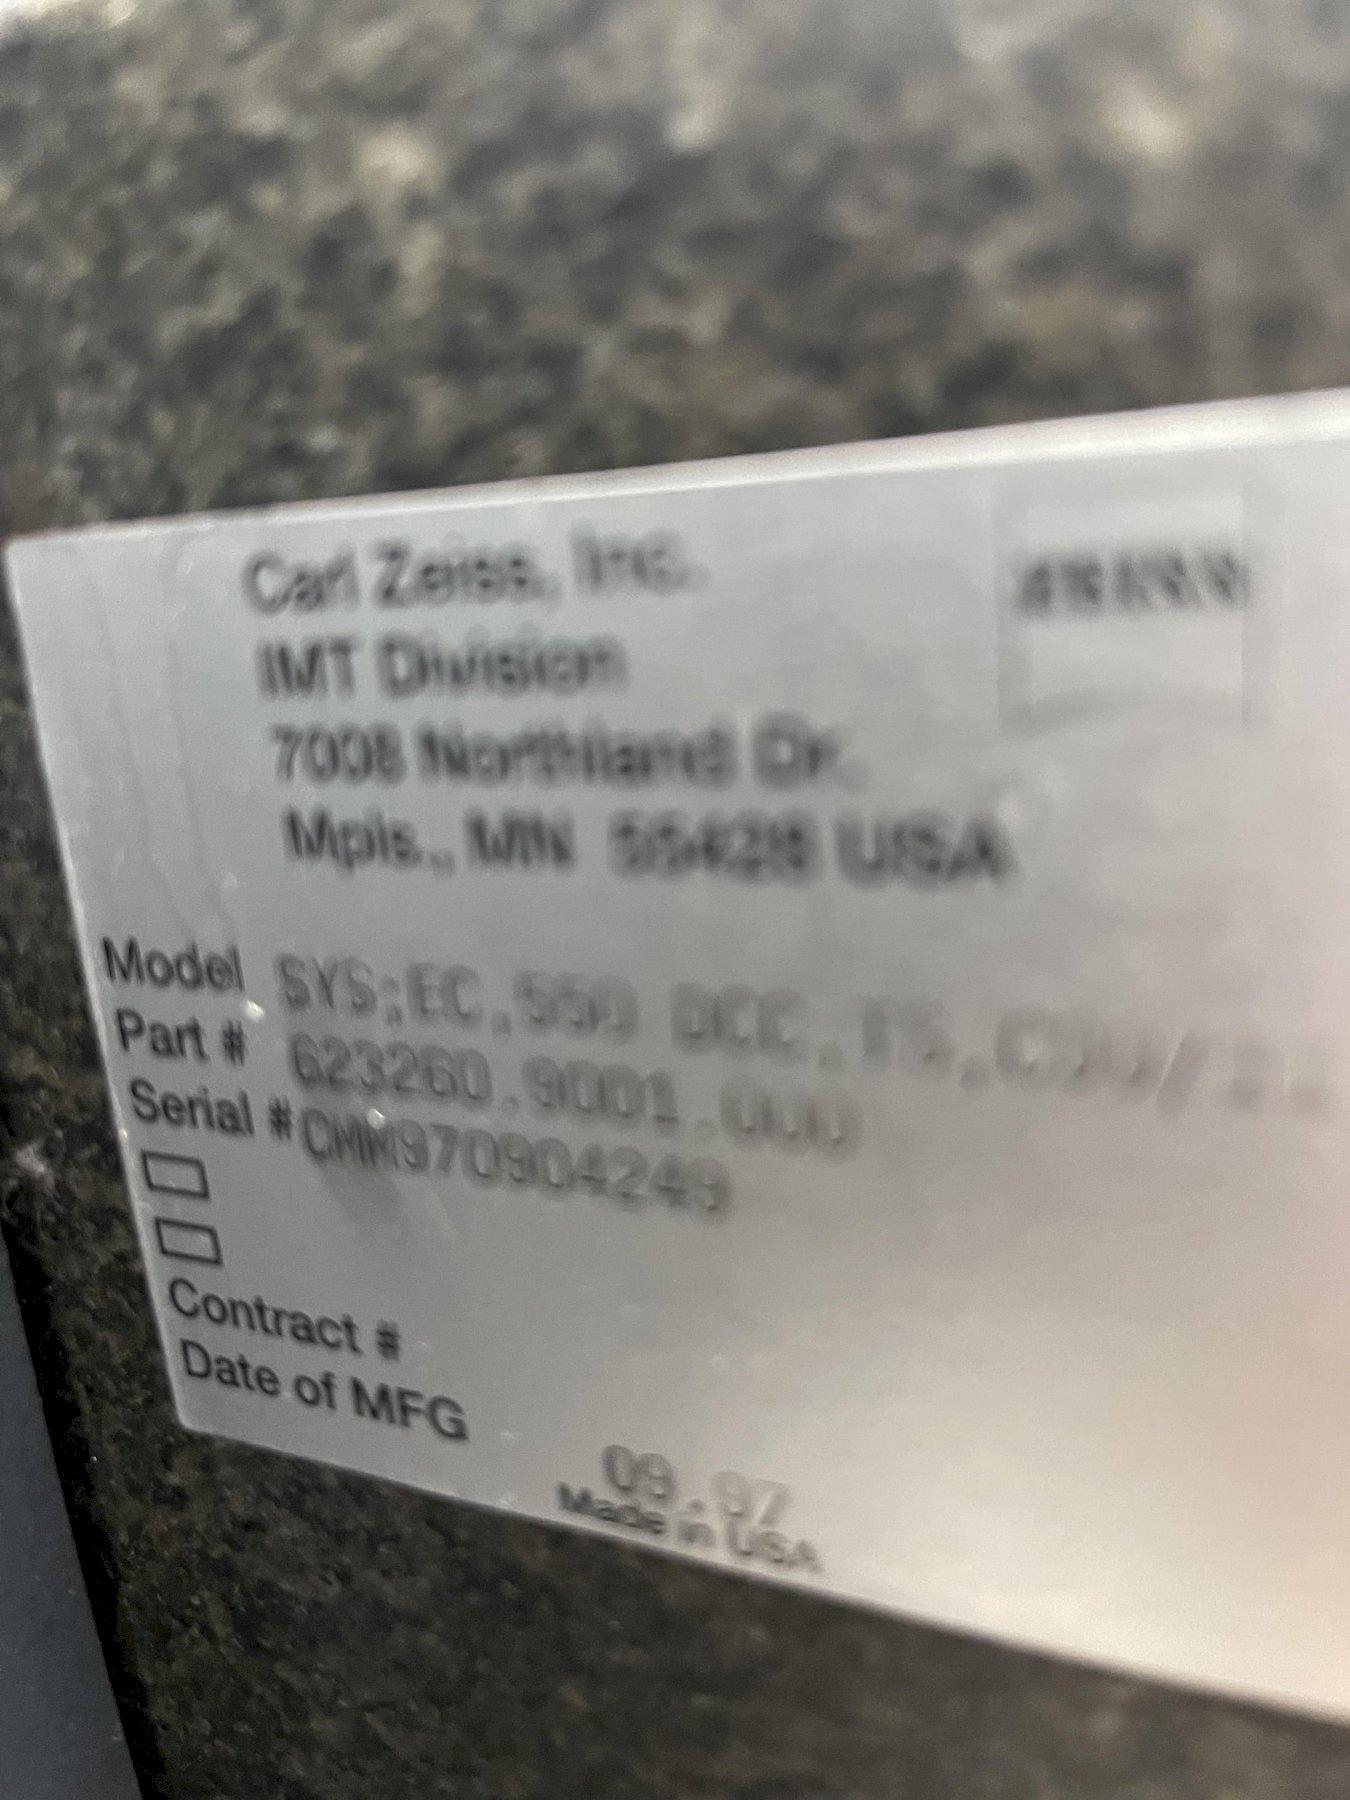 ZEISSZeiss Eclipse 550 Coordinate Measuring Machine (CMM)(#33222)